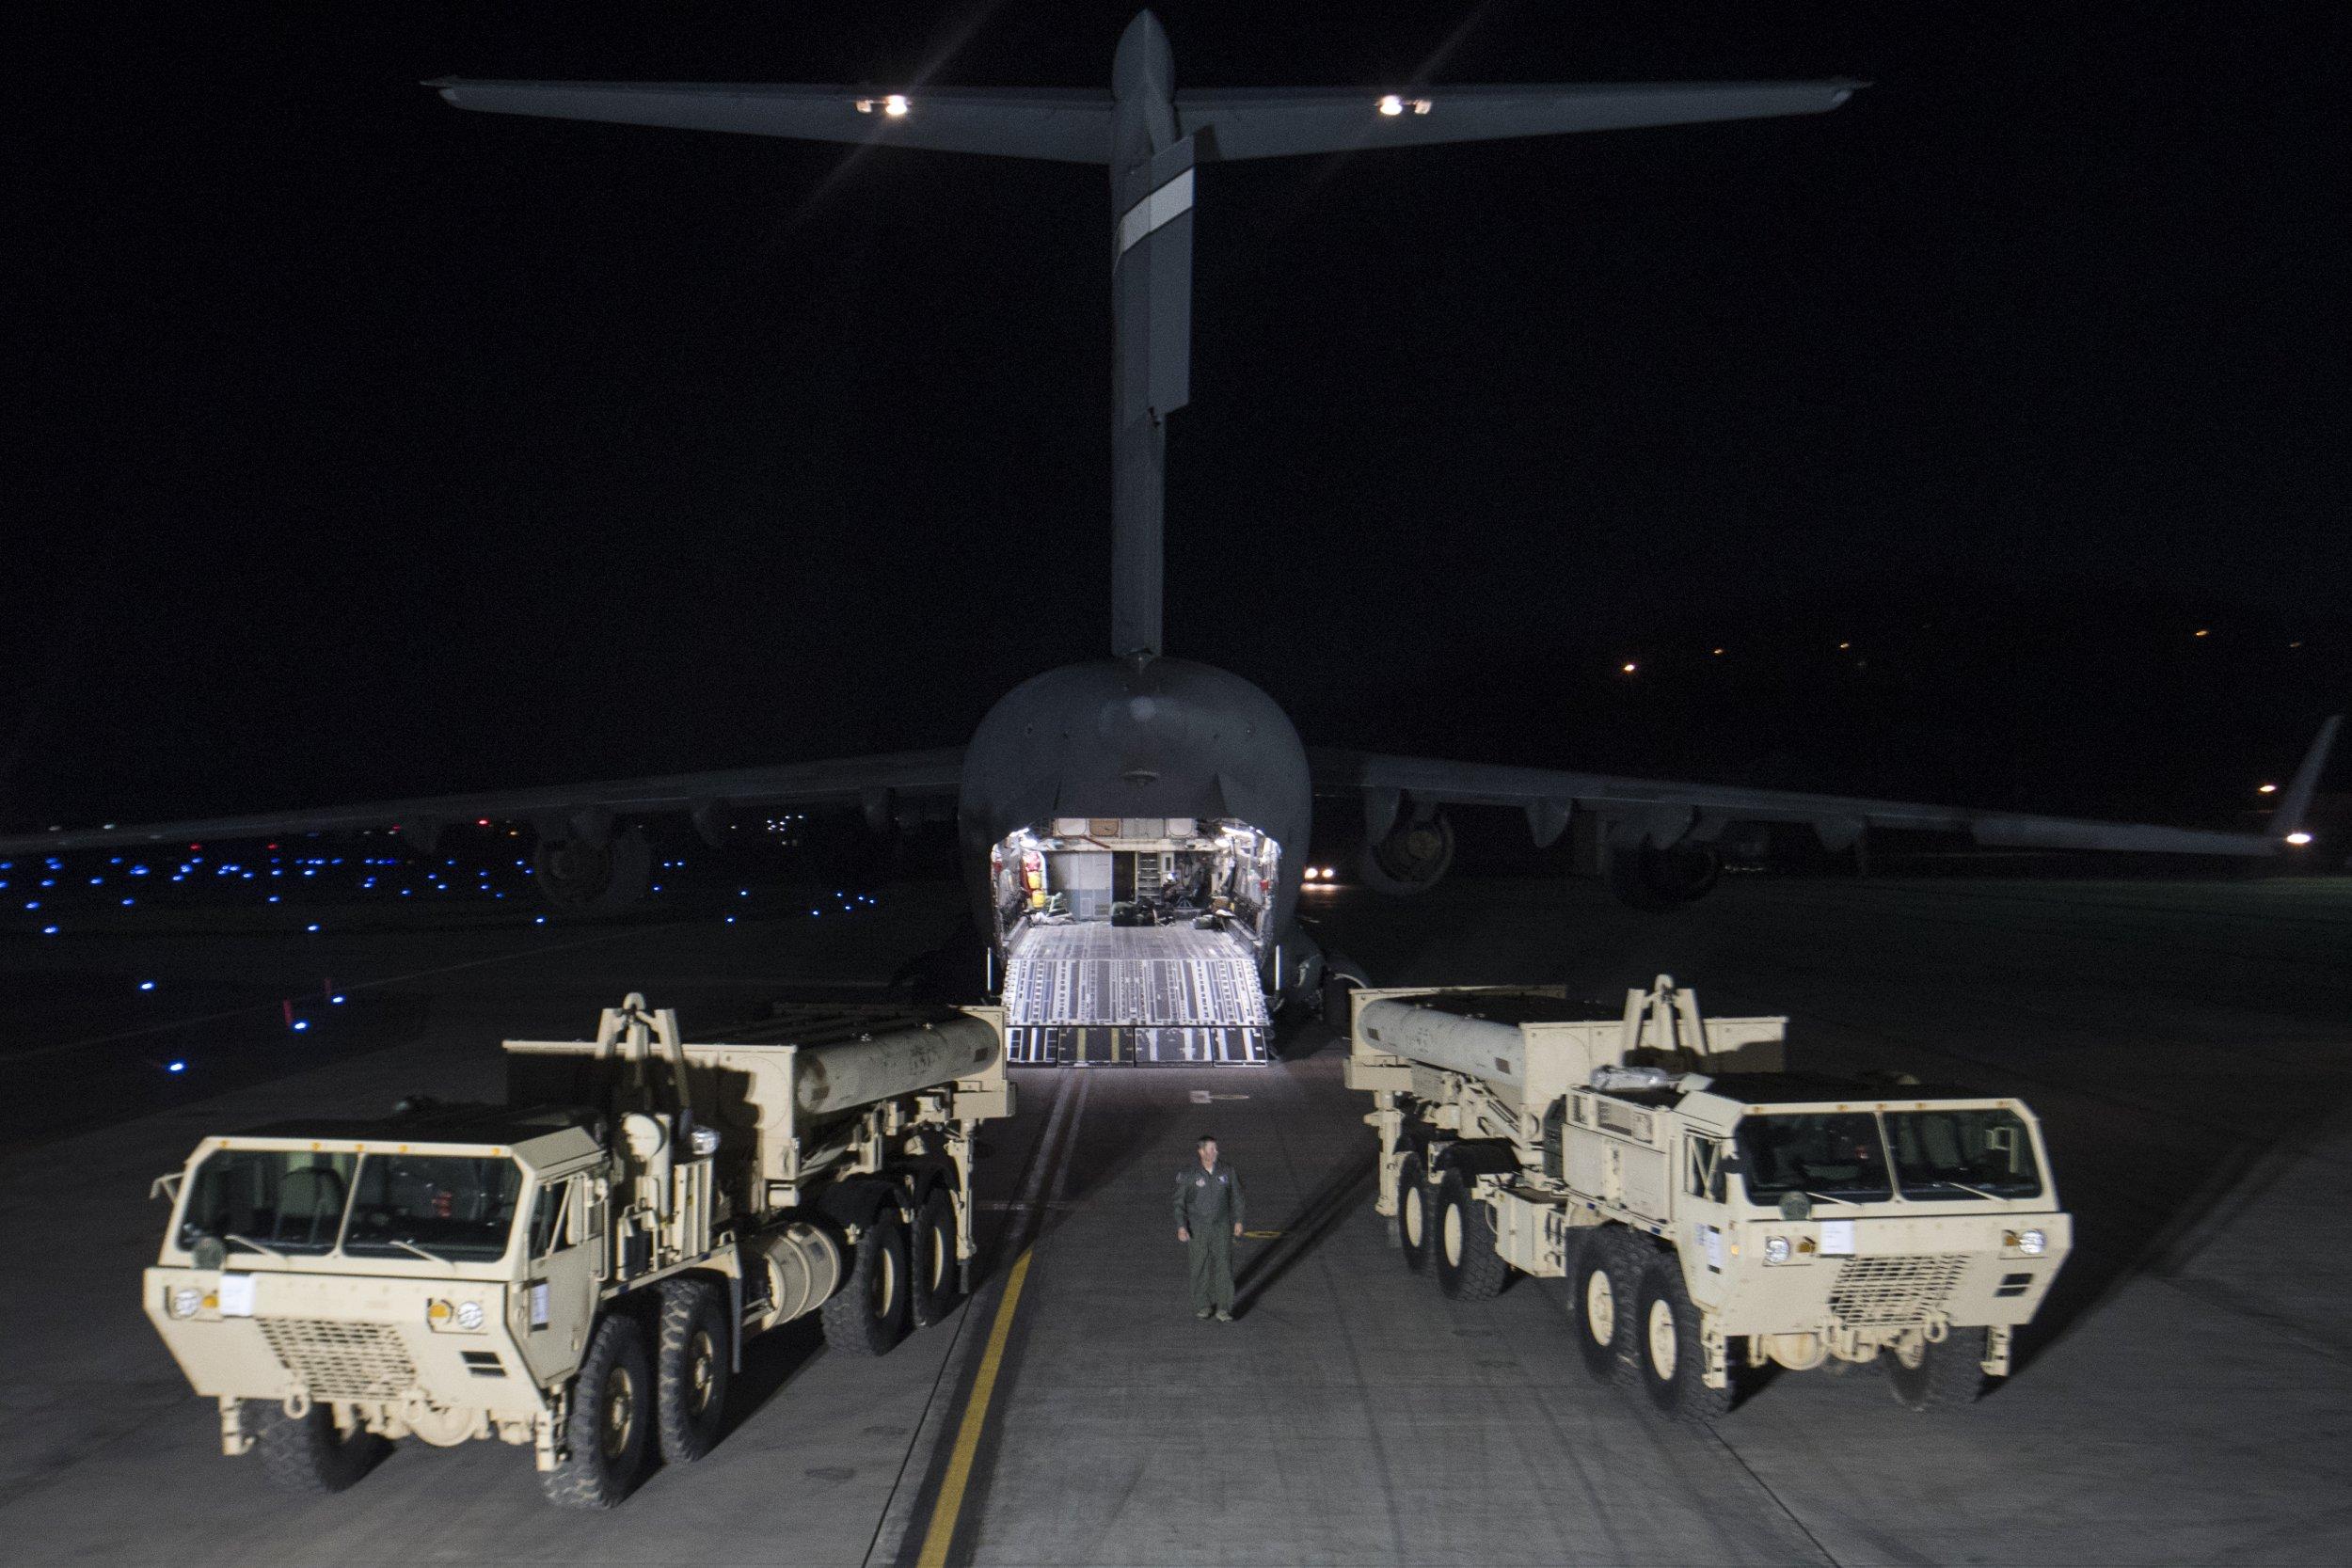 U.S. military trucks by a plane